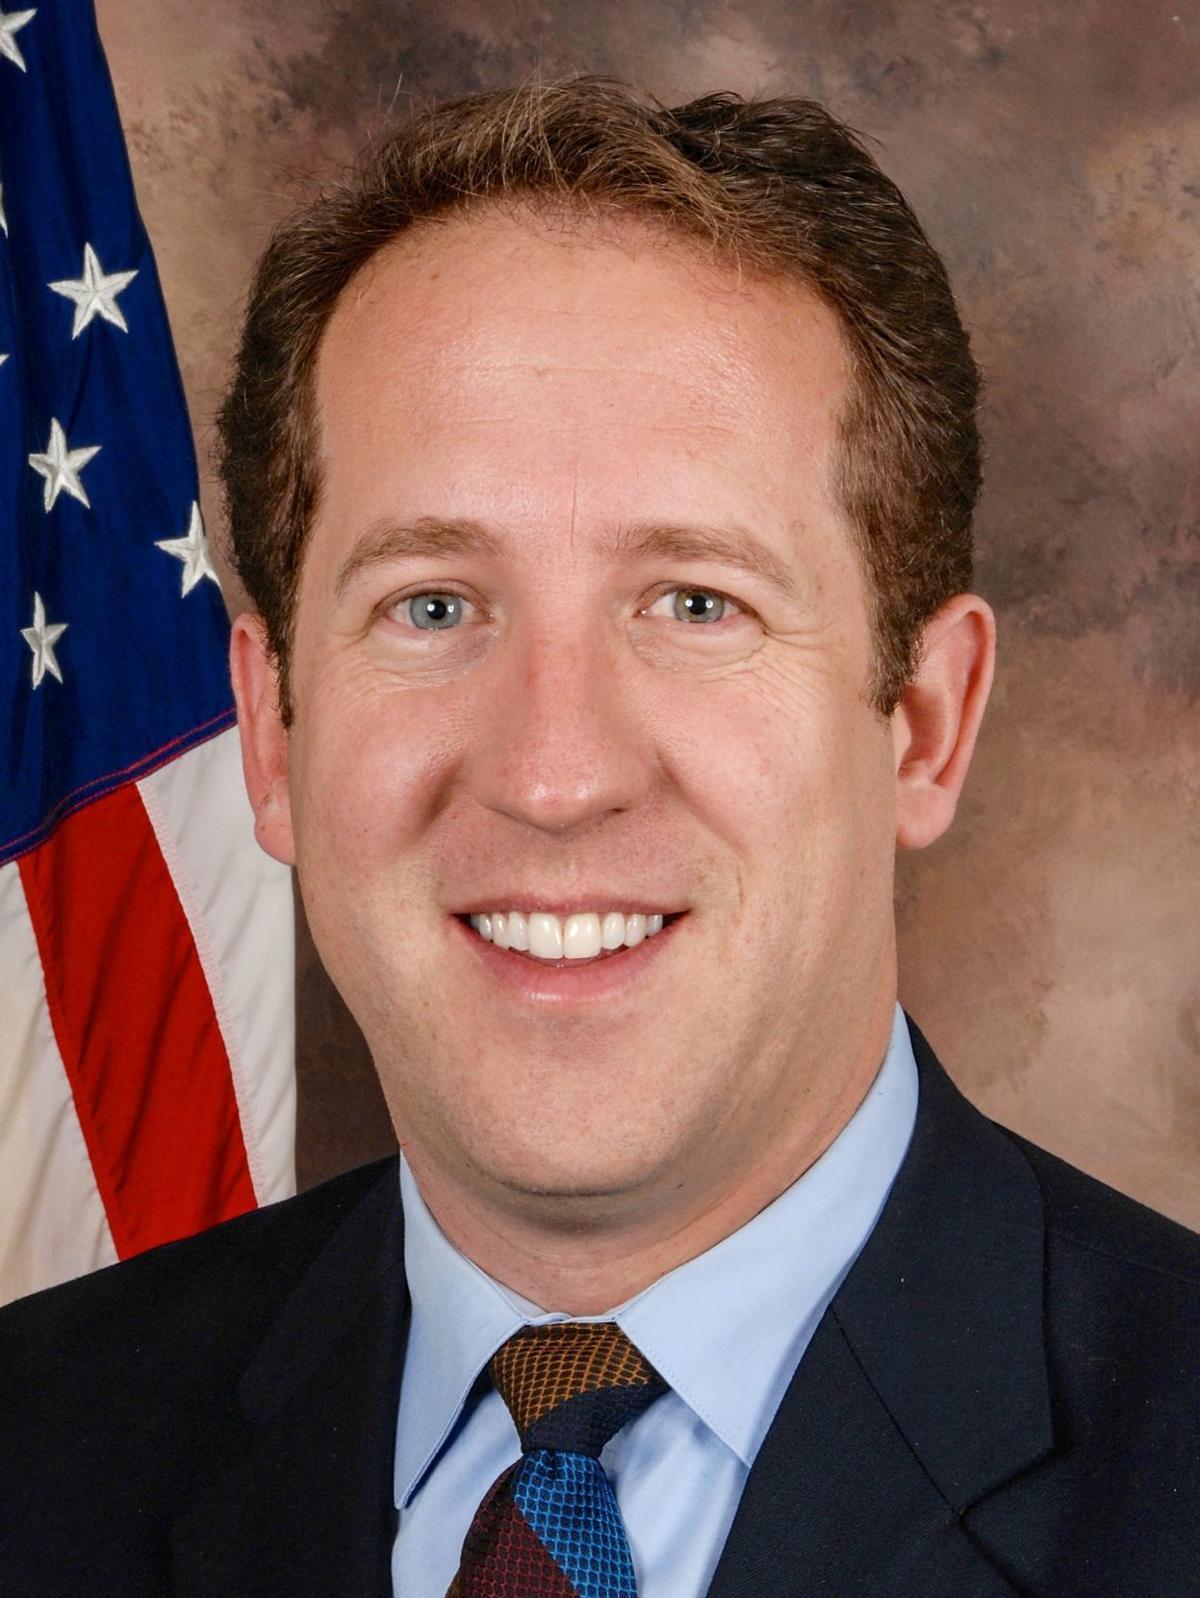 Rep. Adrian Smith, R-Neb.